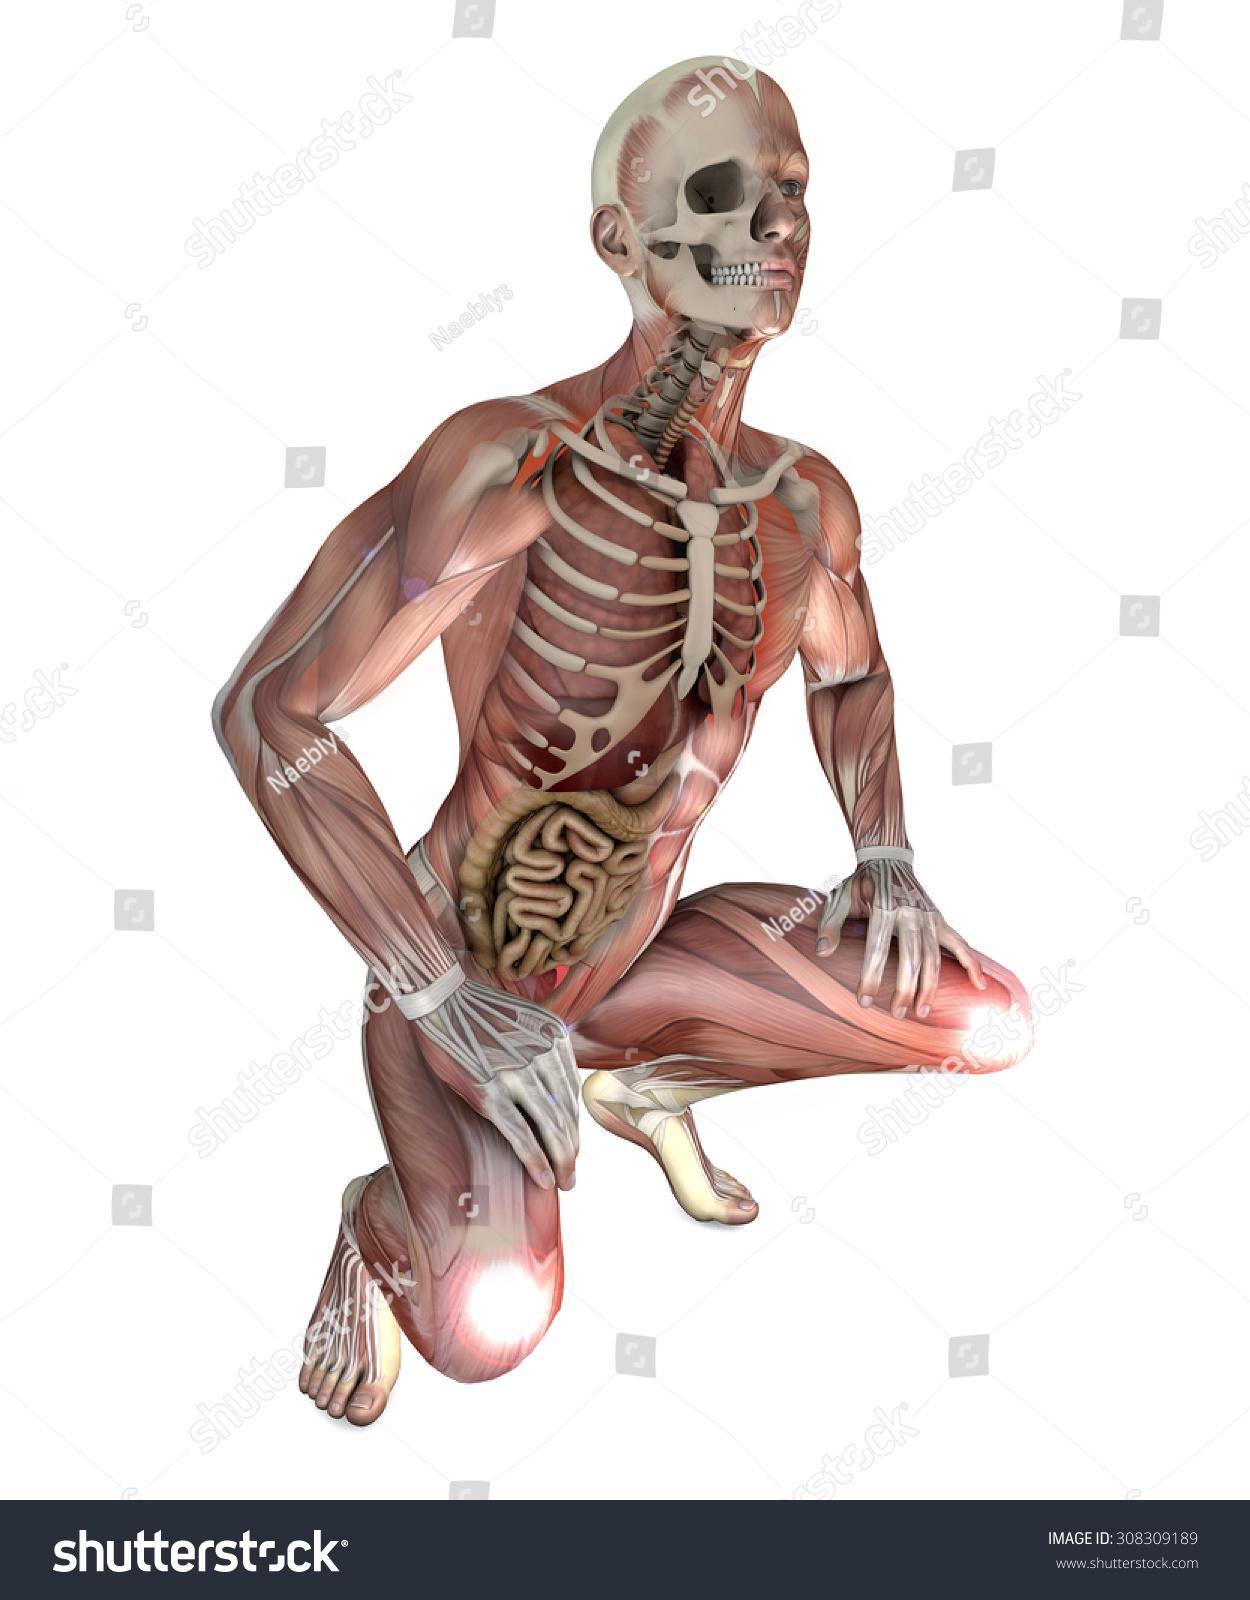 Male Body Skeletal Muscles Organs Stock Illustration Royalty Free